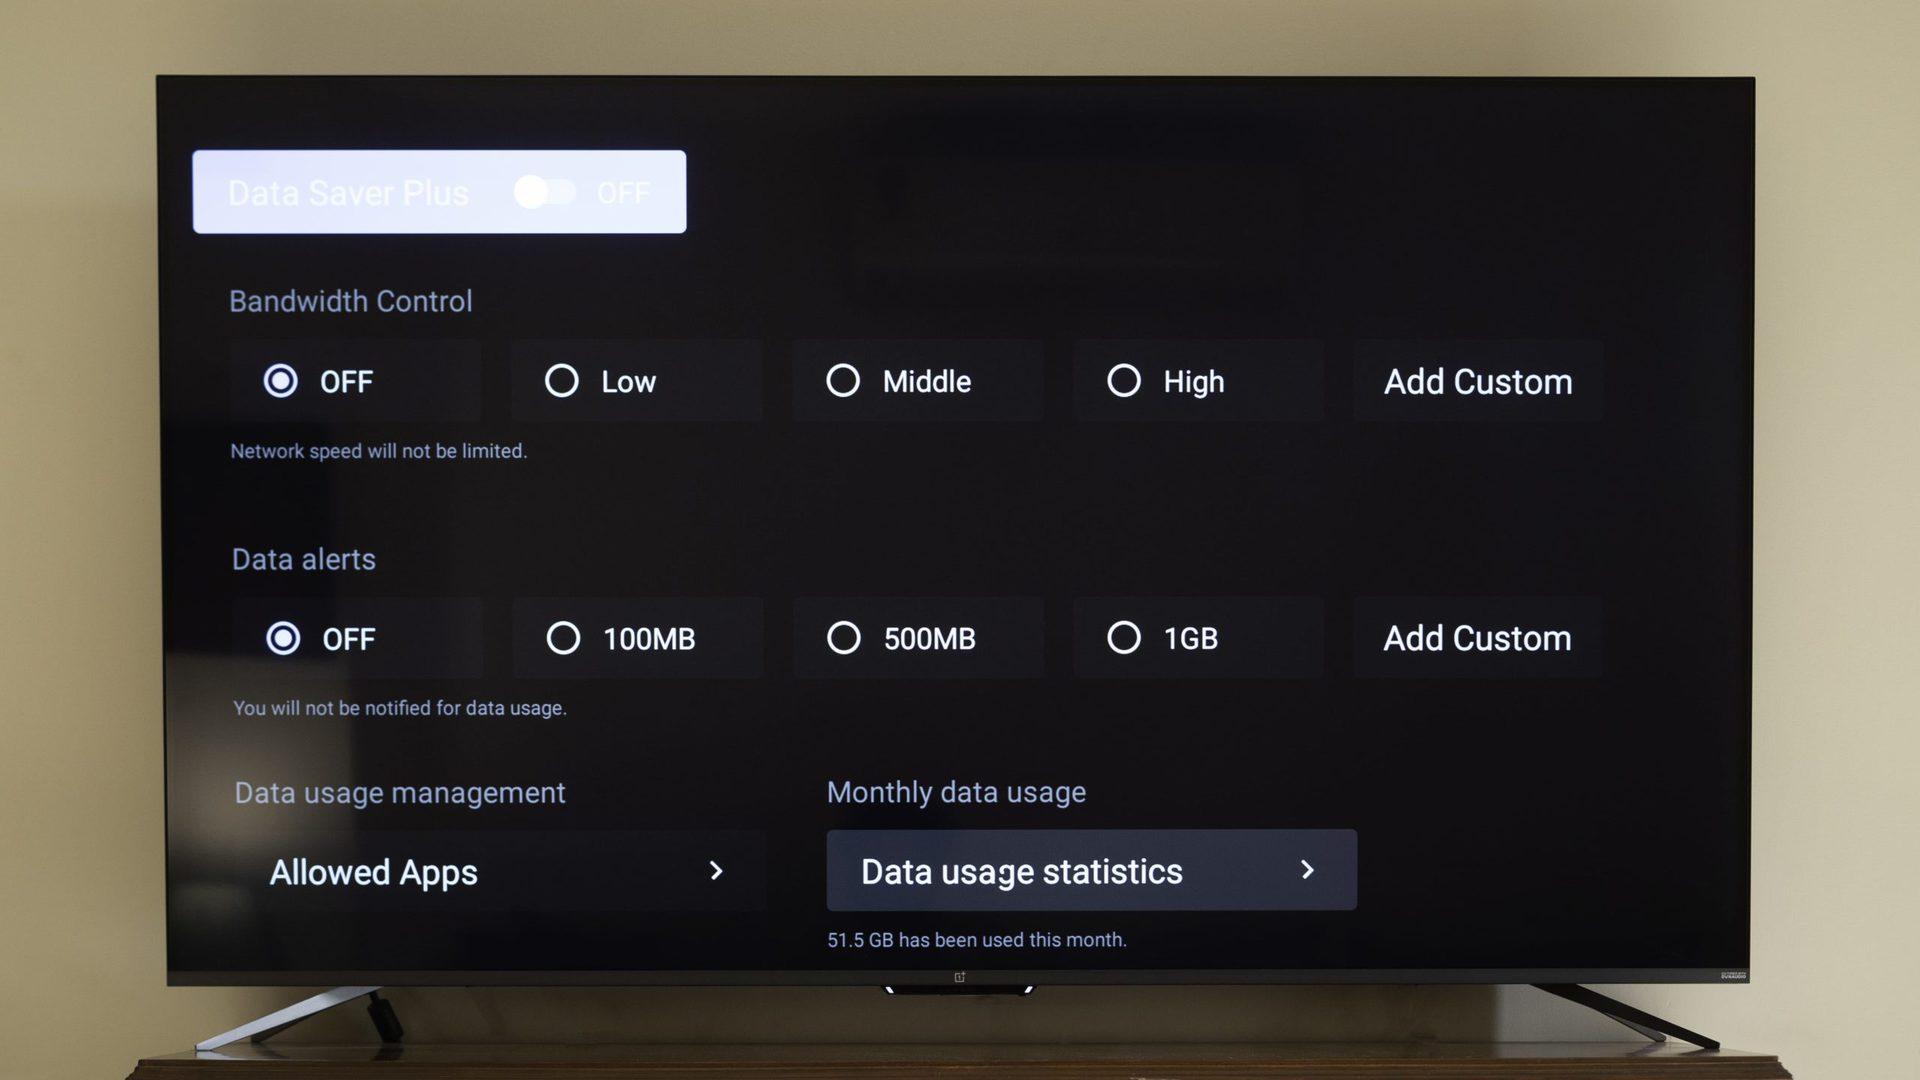 The OnePlus TV U1S bandwidth control.